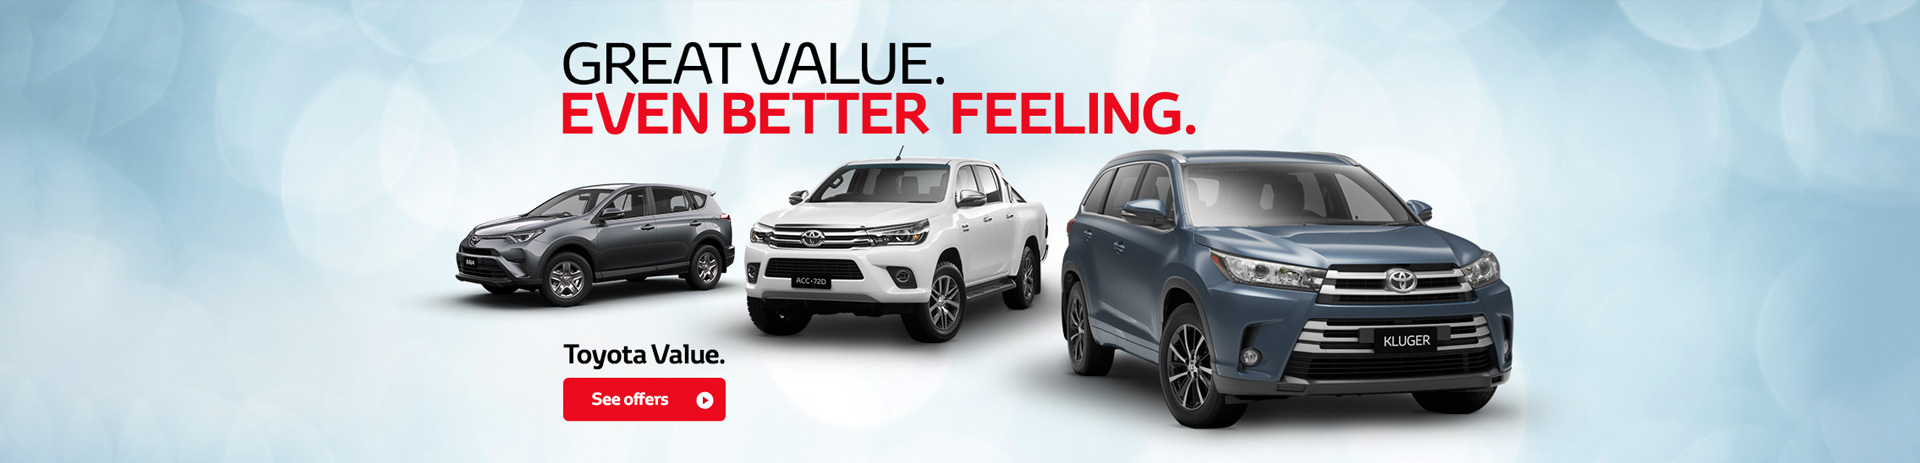 Toyota - Nation Offer - Great Value, Even Better Feeling